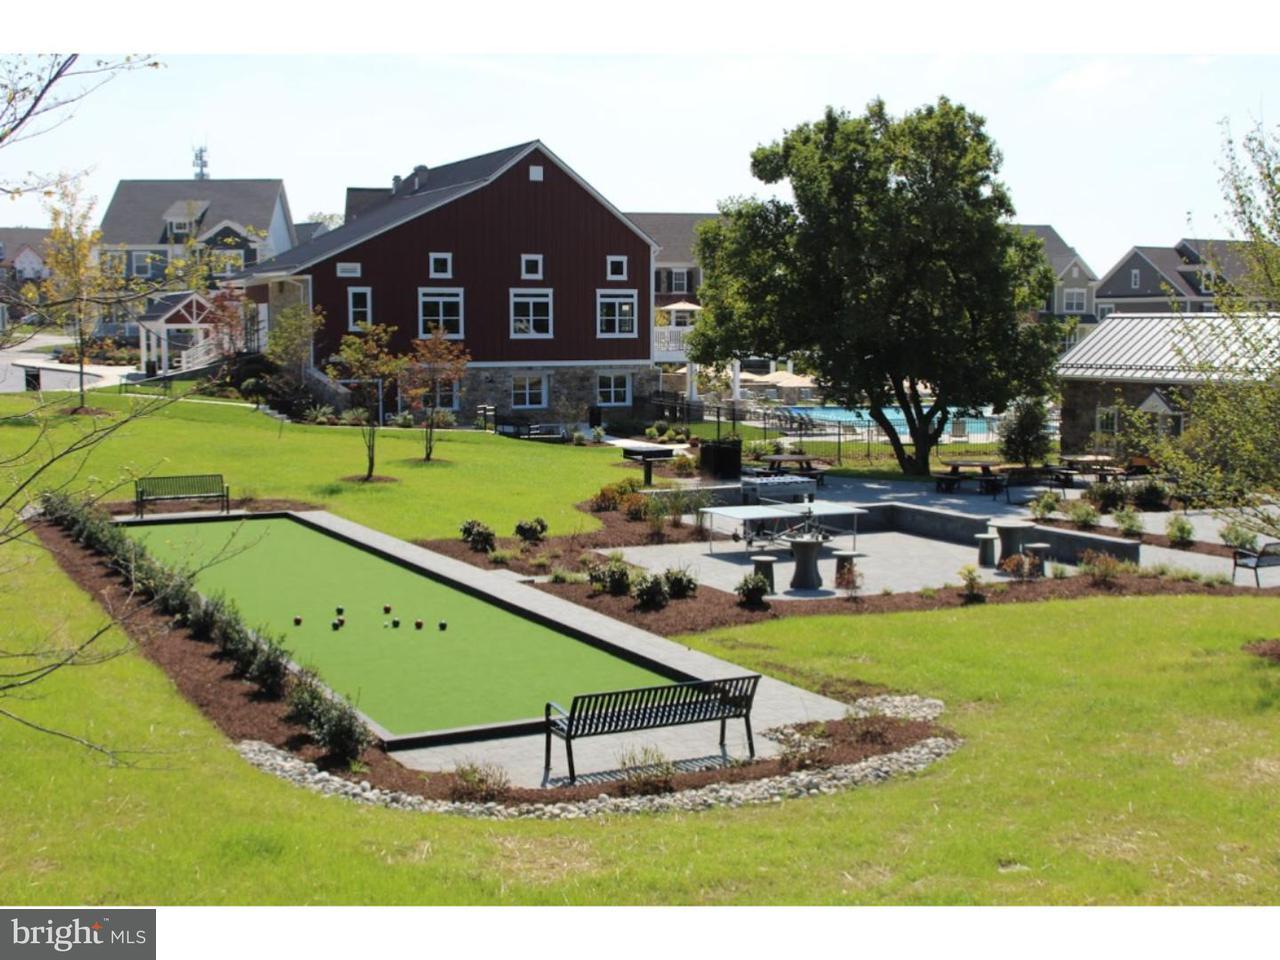 Additional photo for property listing at 133 SPRING OAK DR #00PYT  Malvern, Pennsylvanie 19355 États-Unis